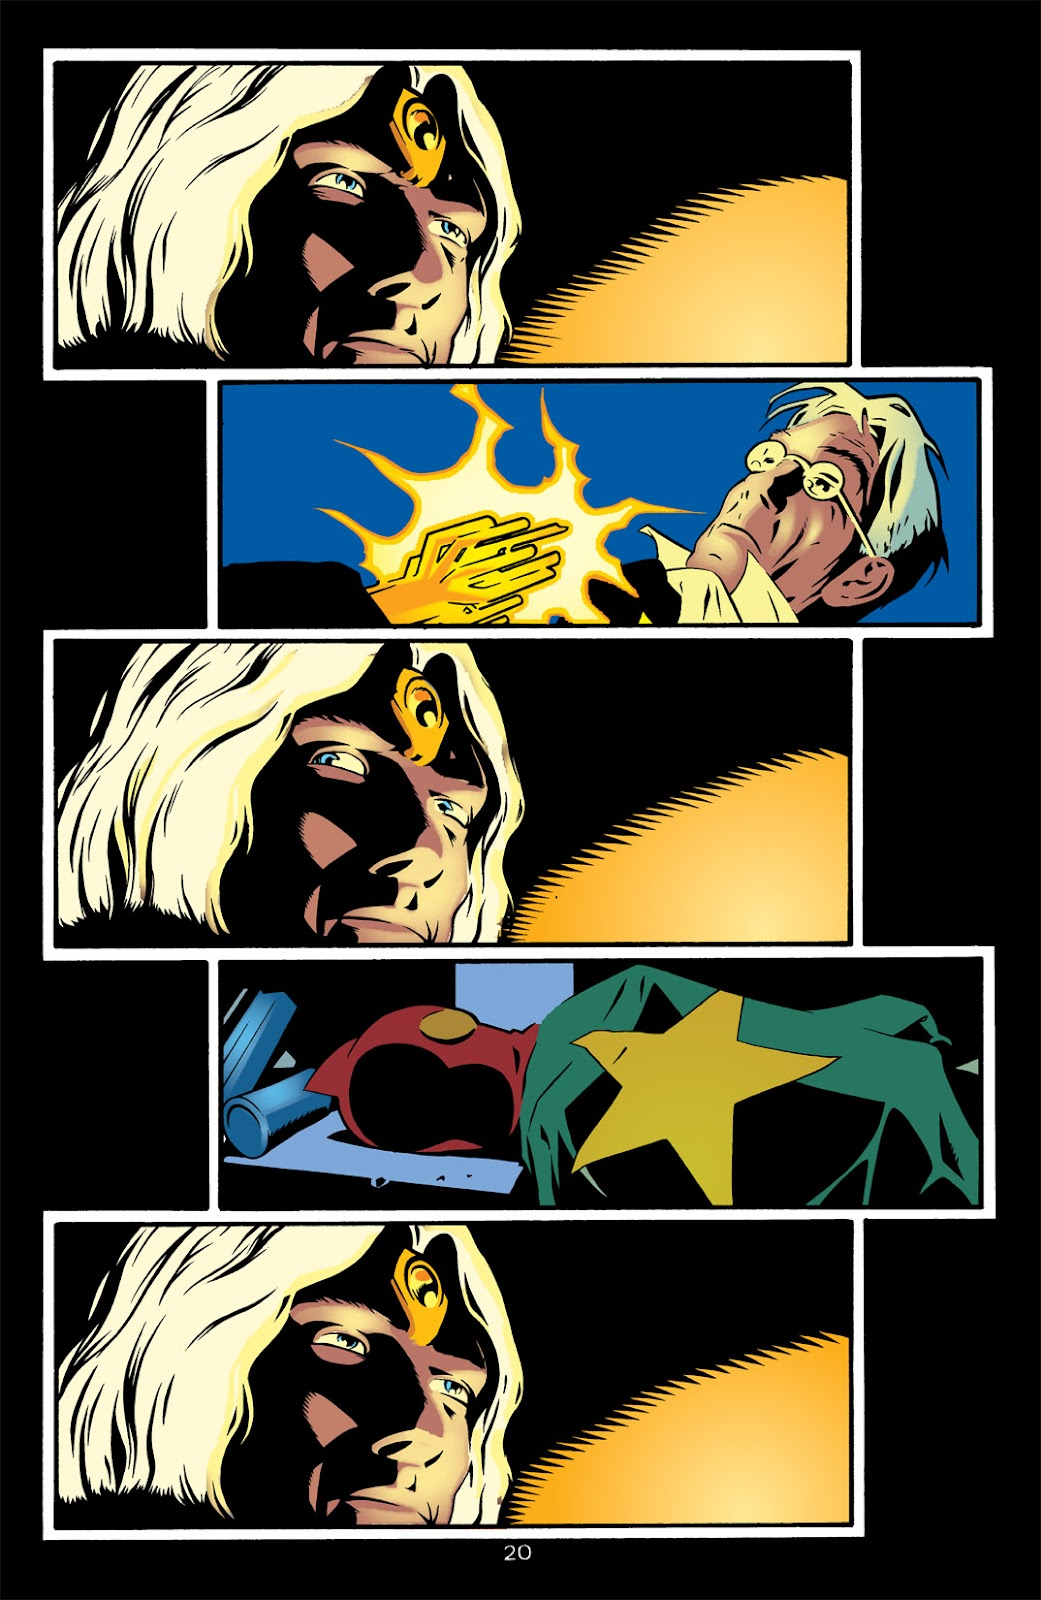 Starman (1994) Issue #1000000 #83 - English 20